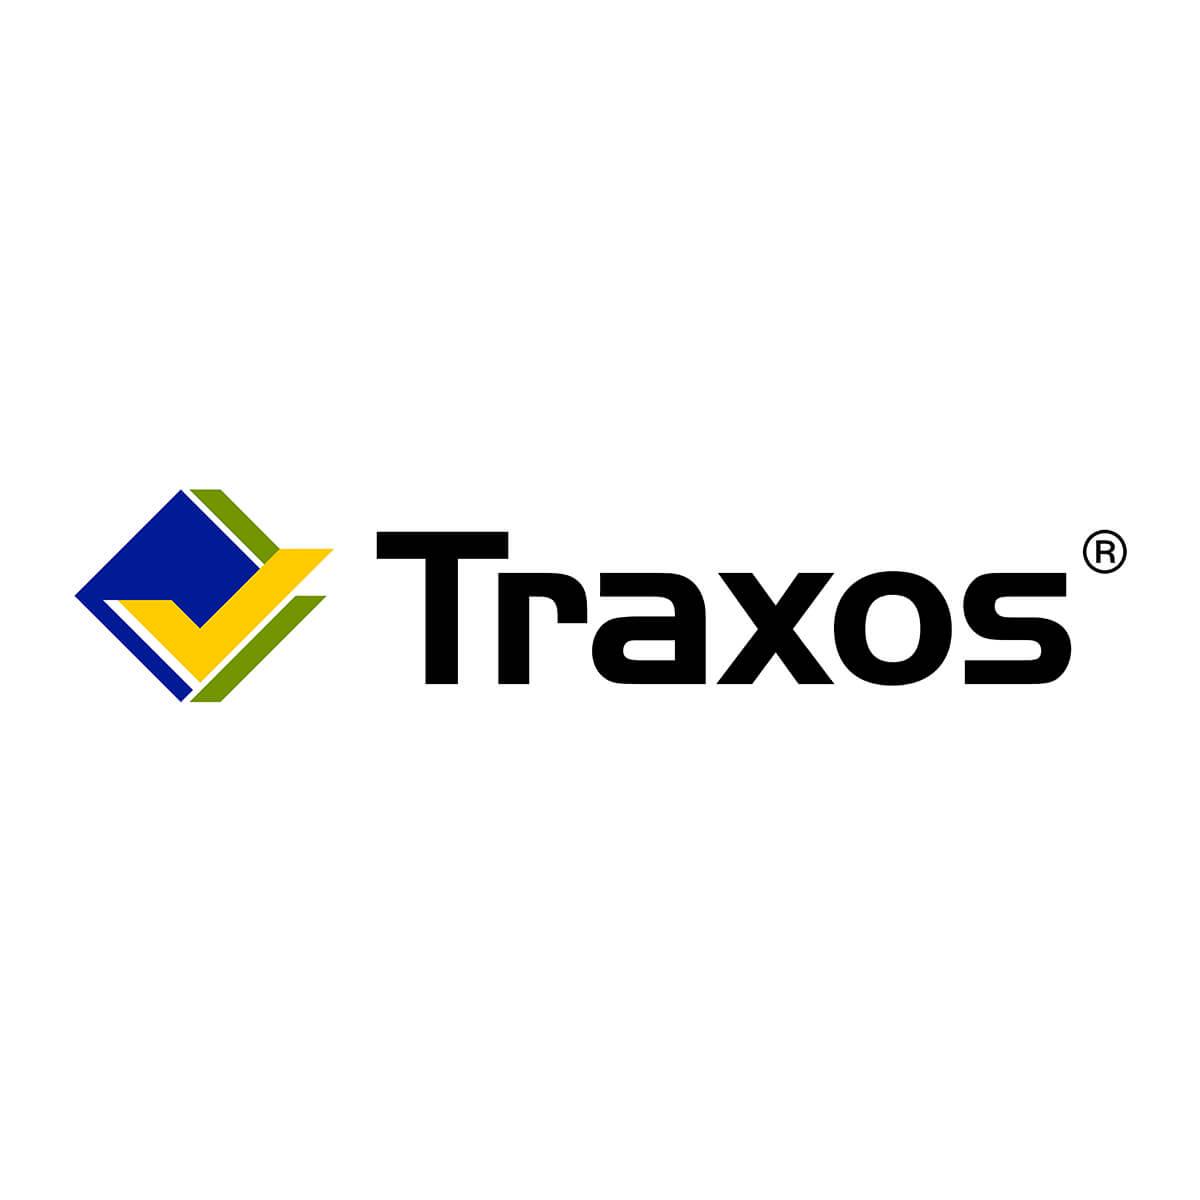 TRAXOS 20AC 10L